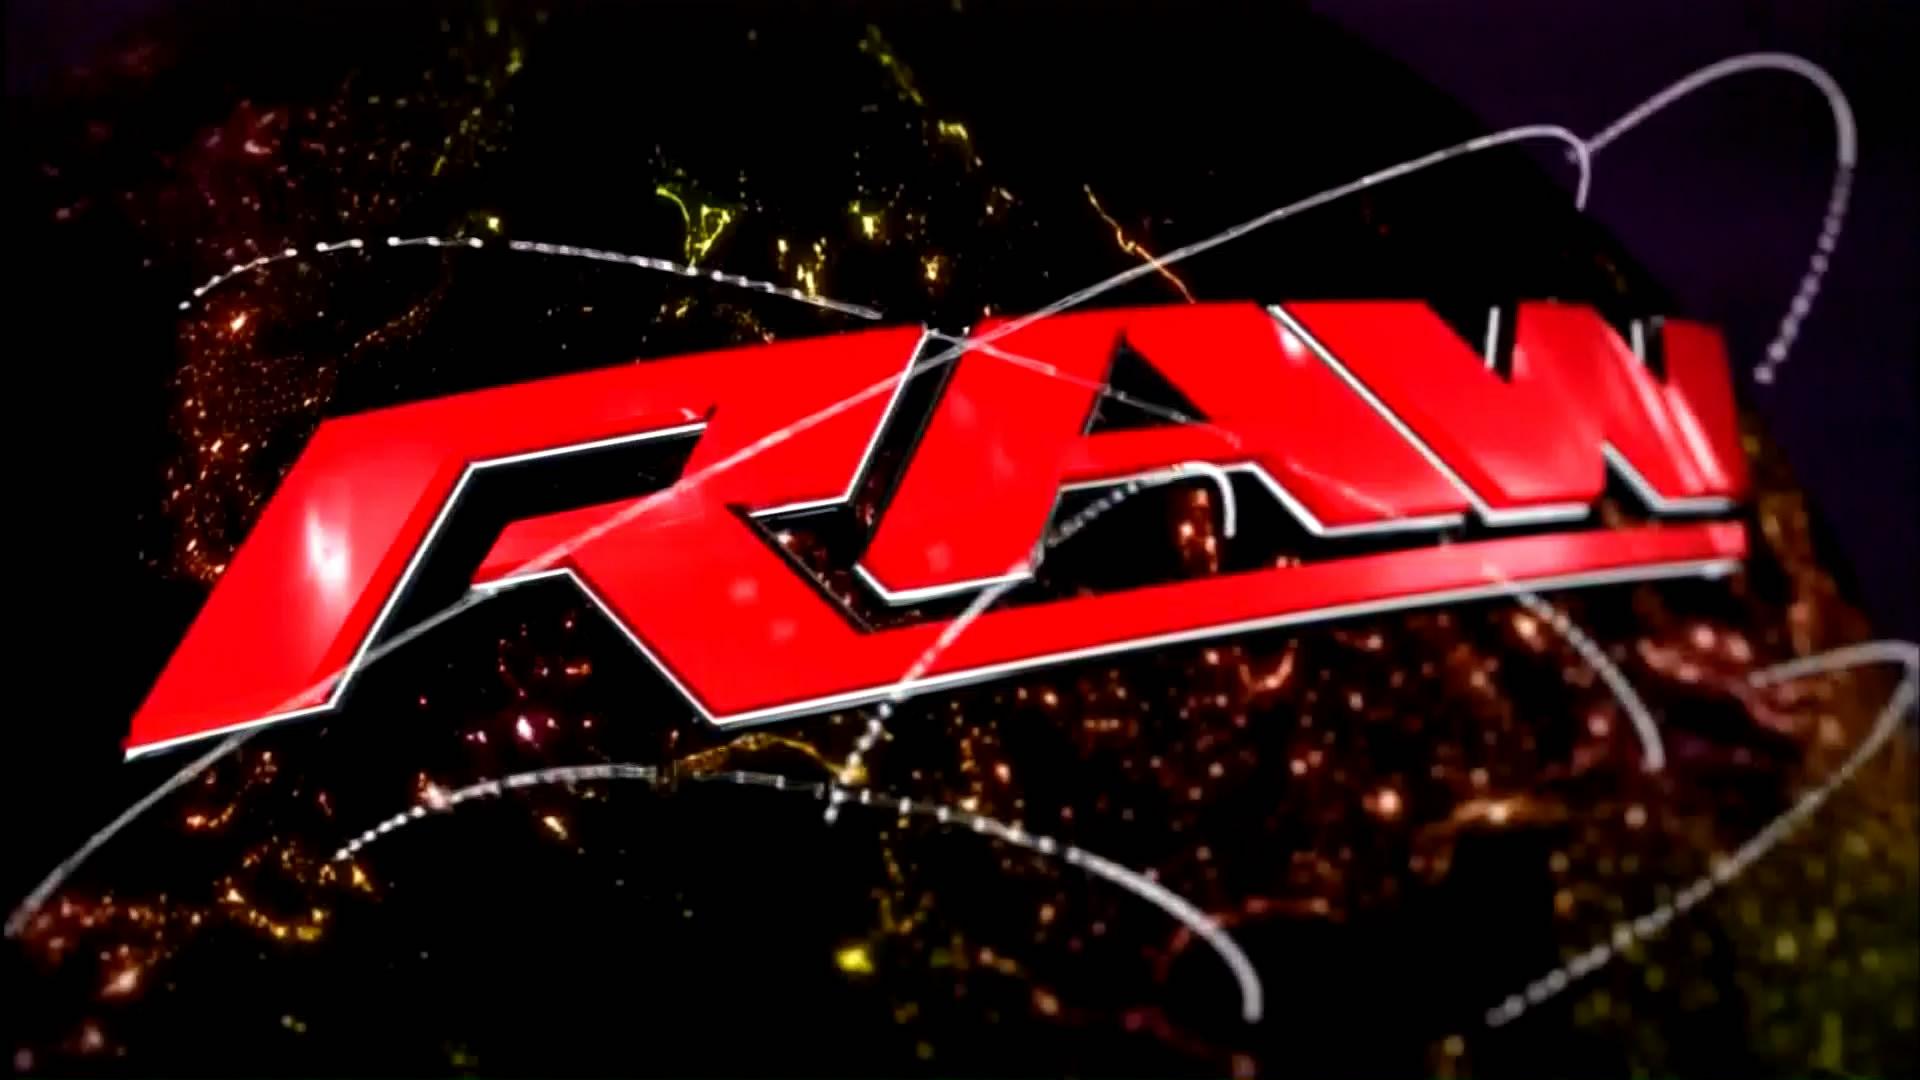 Daniel Bryan Enjoying His Honeymoon Wwe Raw Dark Match Http Www Wrestlesite Com Wwe Daniel Bryan Enjoying Honeymo Raw Wwe Monday Raw Wwe Raw And Smackdown